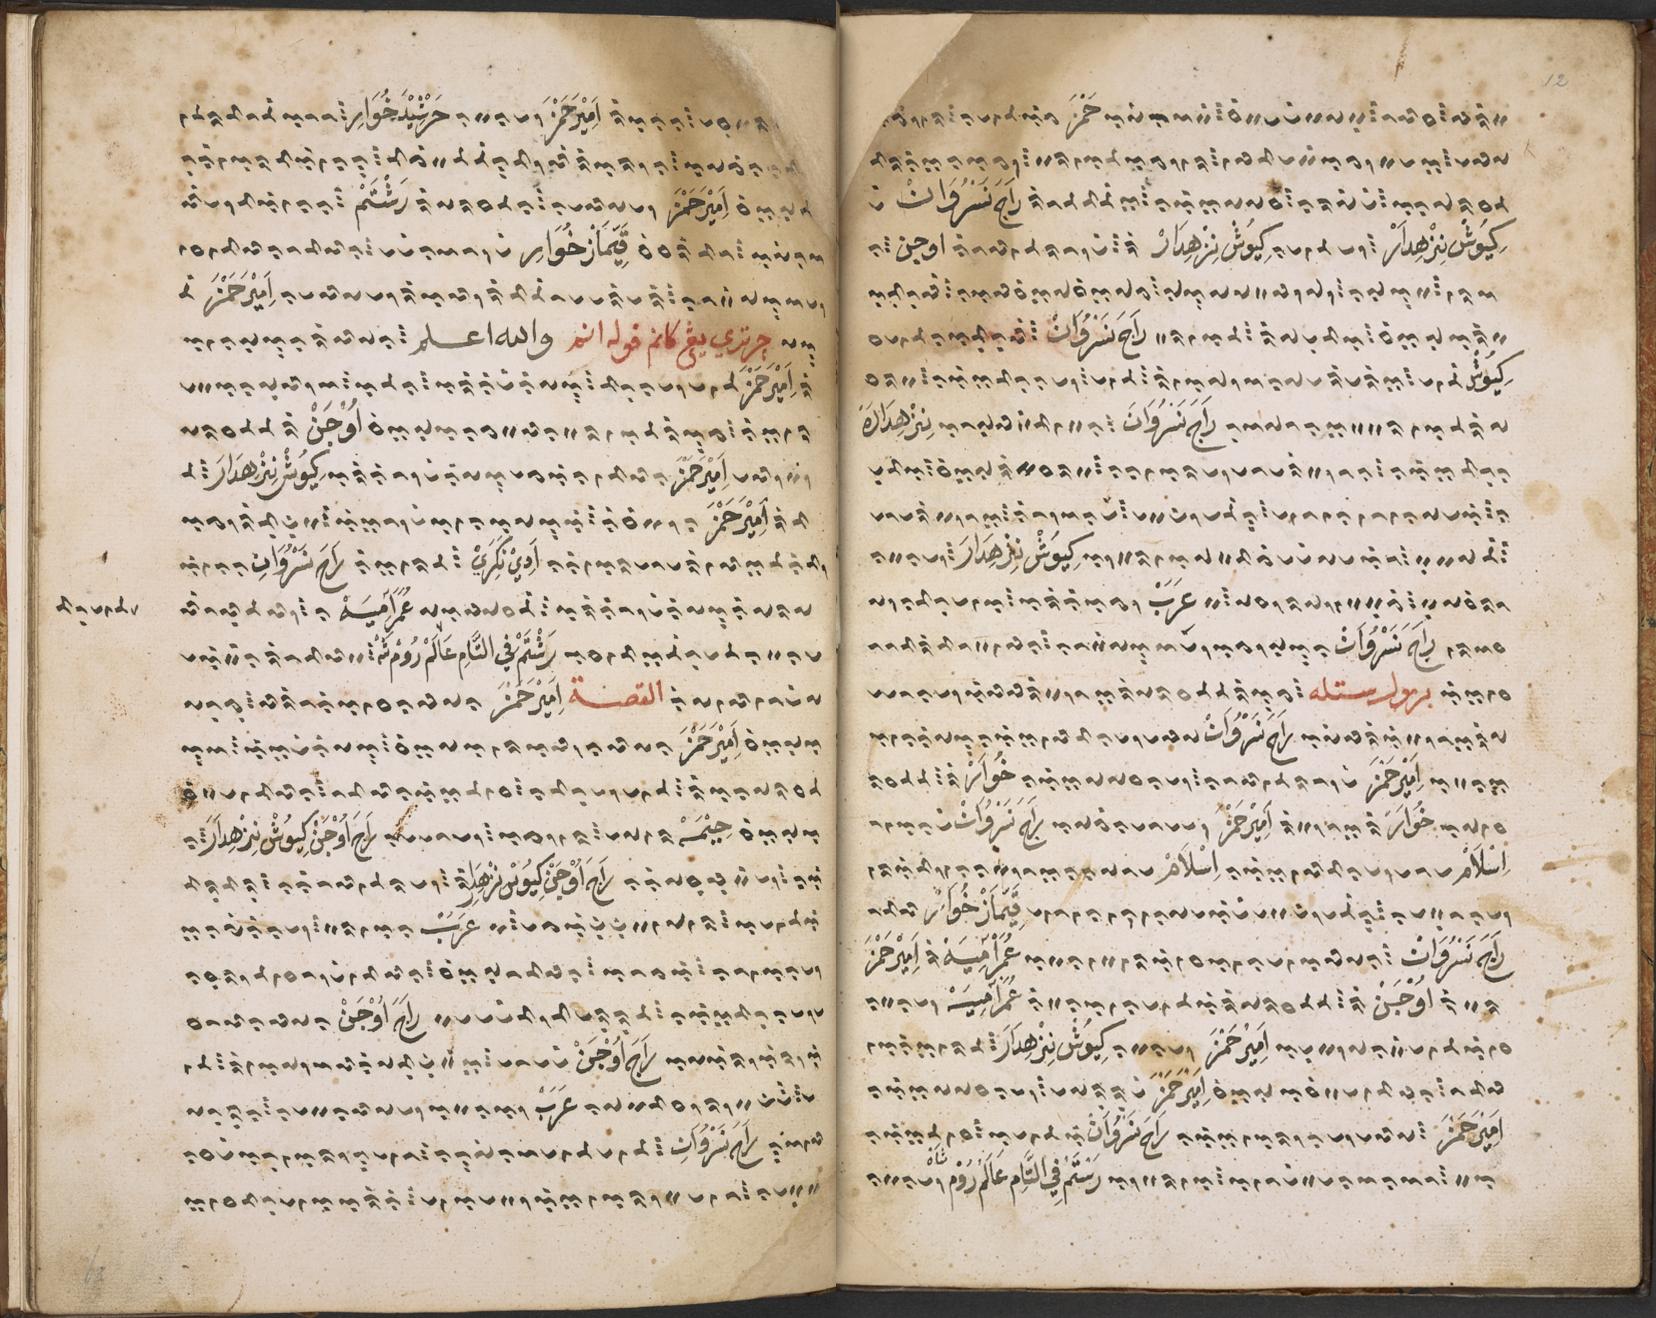 Javanese Manuscript of the Adventures of Amir Hamza 1800 AD Manuscripts